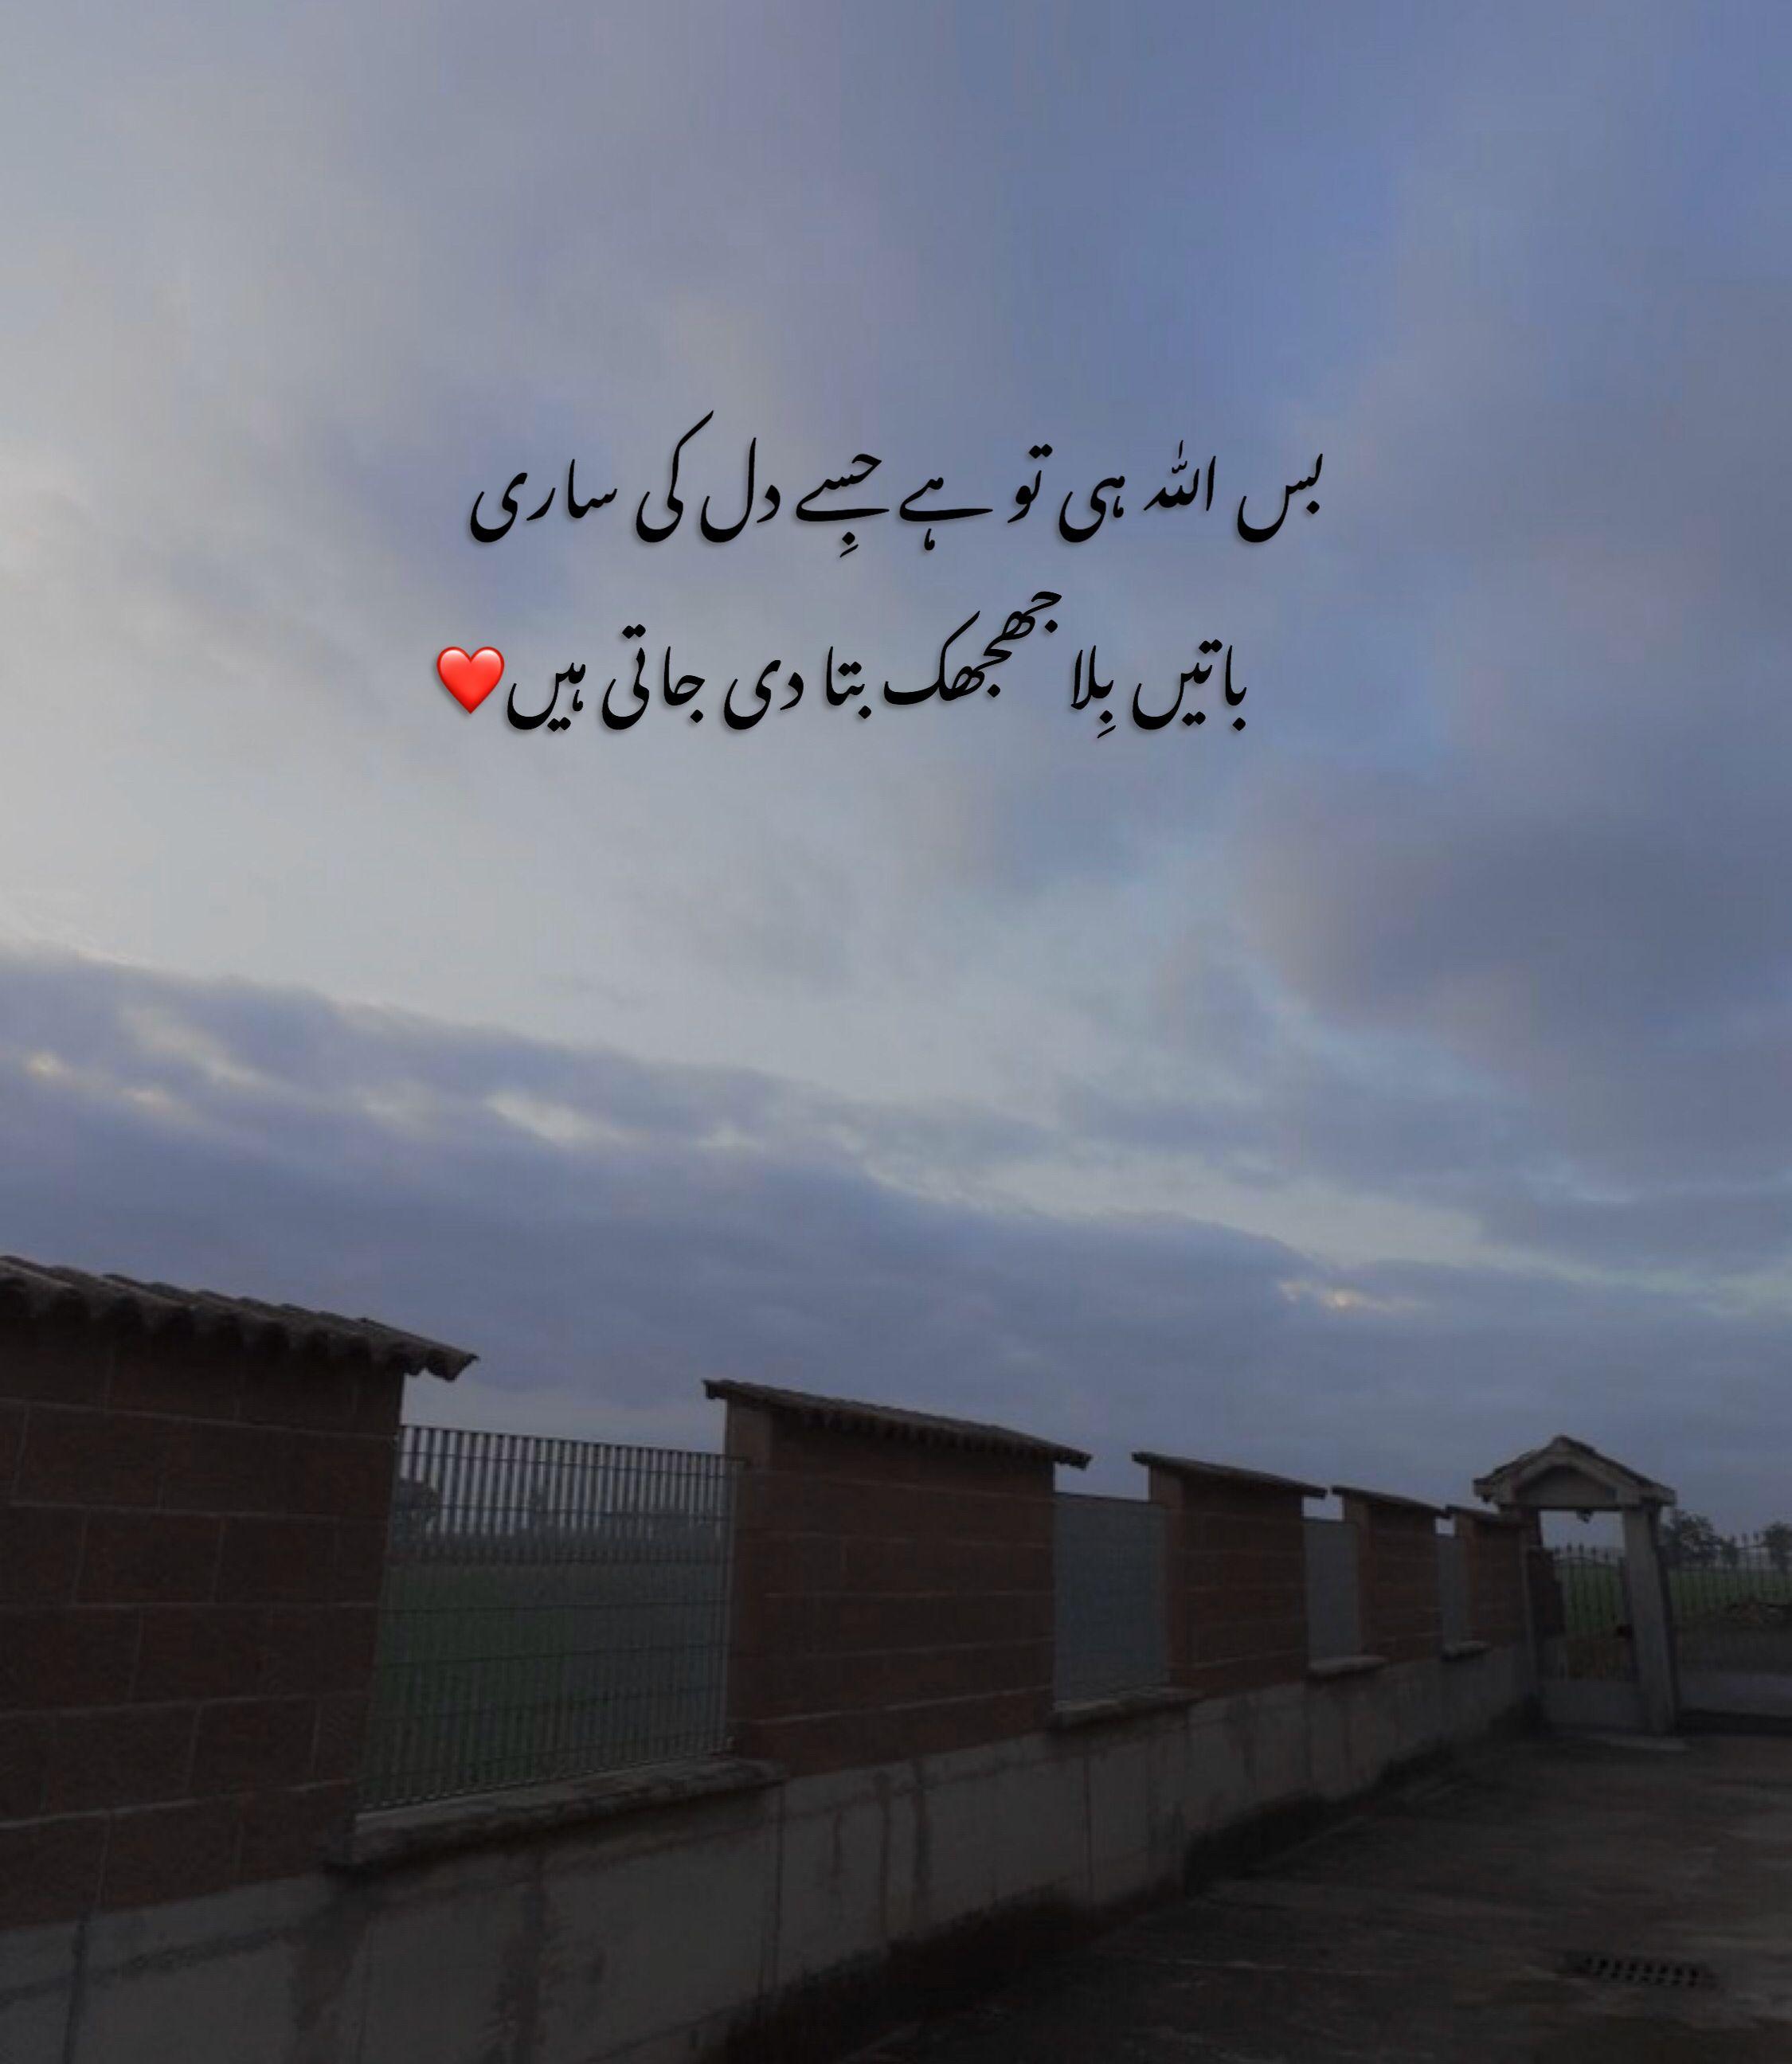 Pin by Zainab ali on از قلم رحاب اعجاز in 2020 Urdu